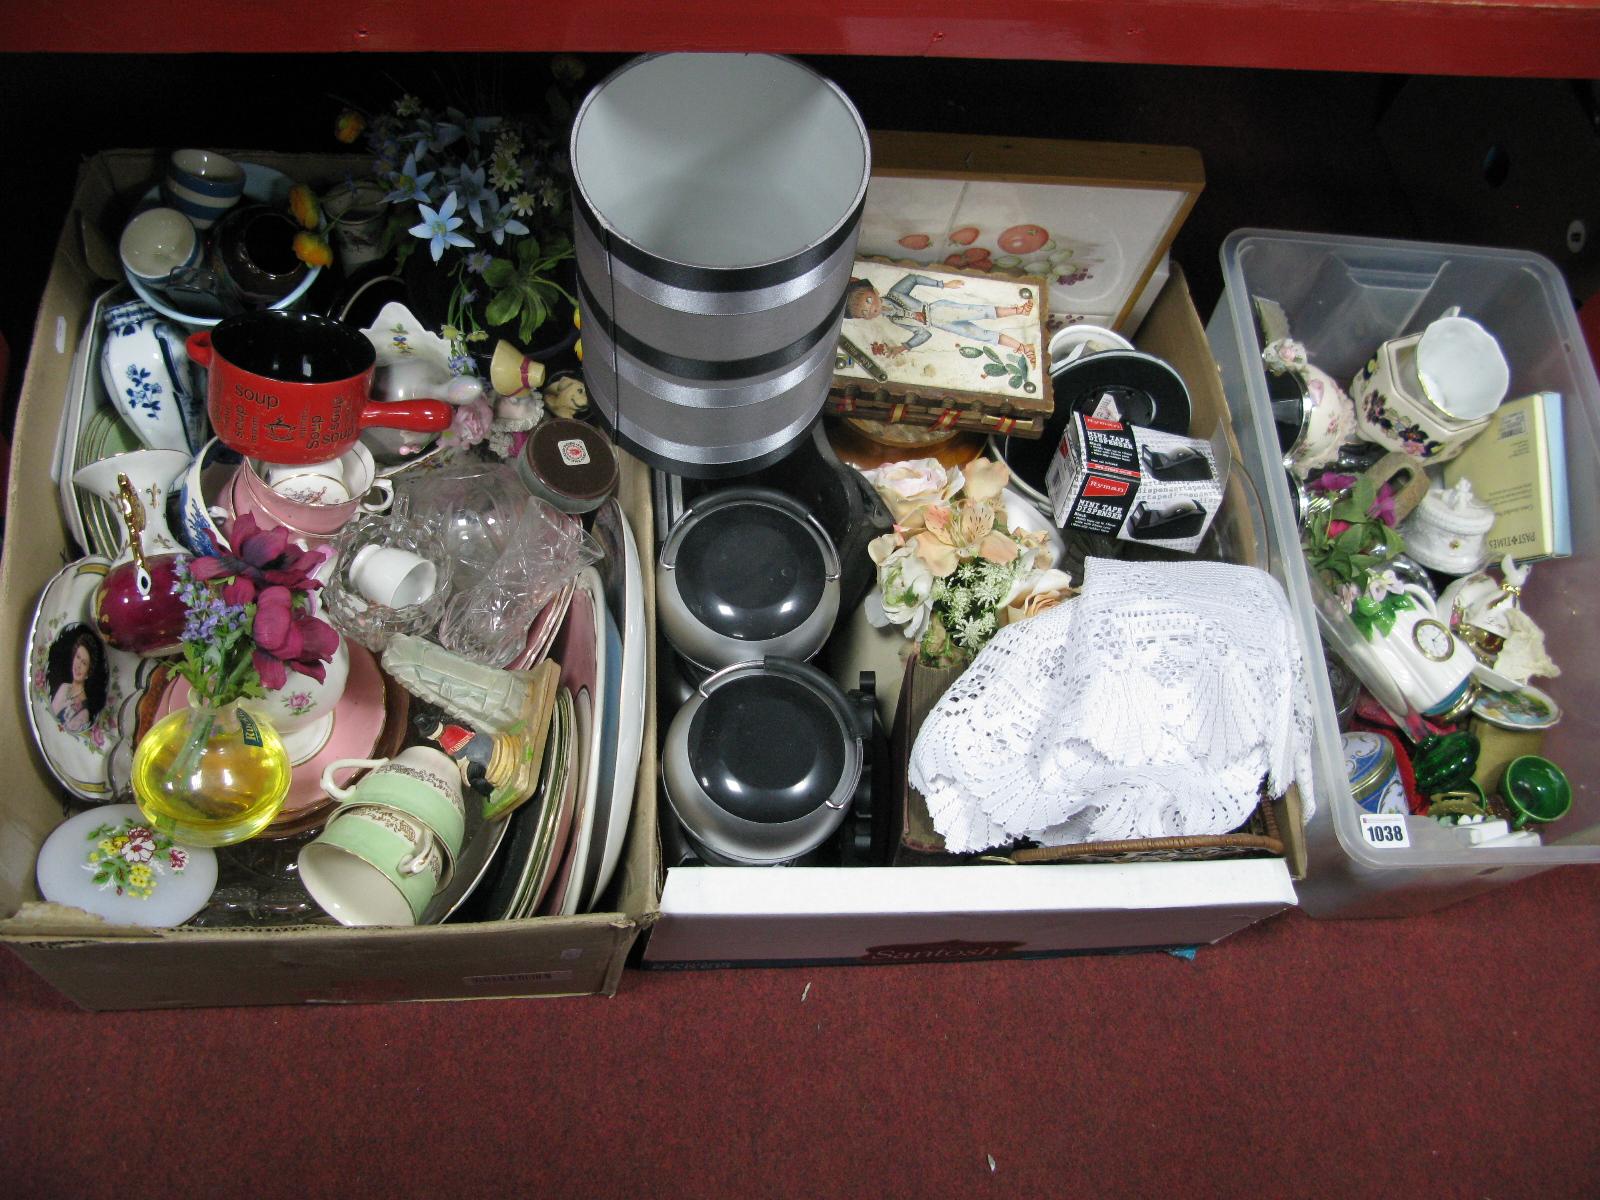 Lot 1038 - Tariff and Hurricane Lamps, ceramics, glassware, etc:- Thee Boxes